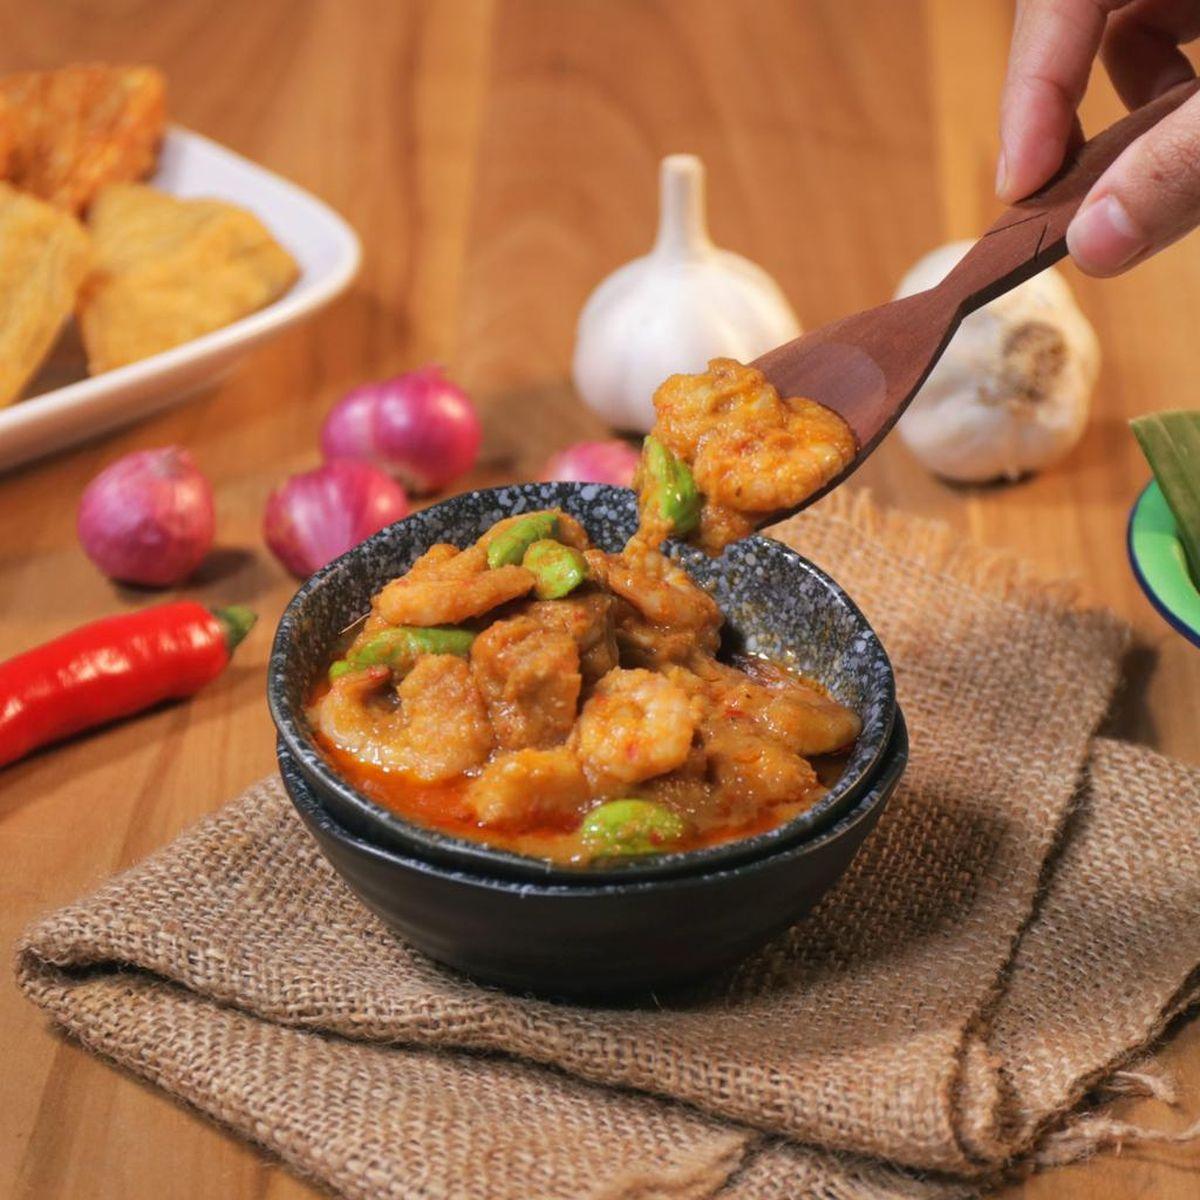 membuat sambal udang kering ala malaysia  resep udang malaysia enak  sederhana ala Resepi Sotong Masak Kari Azie Kitchen Enak dan Mudah